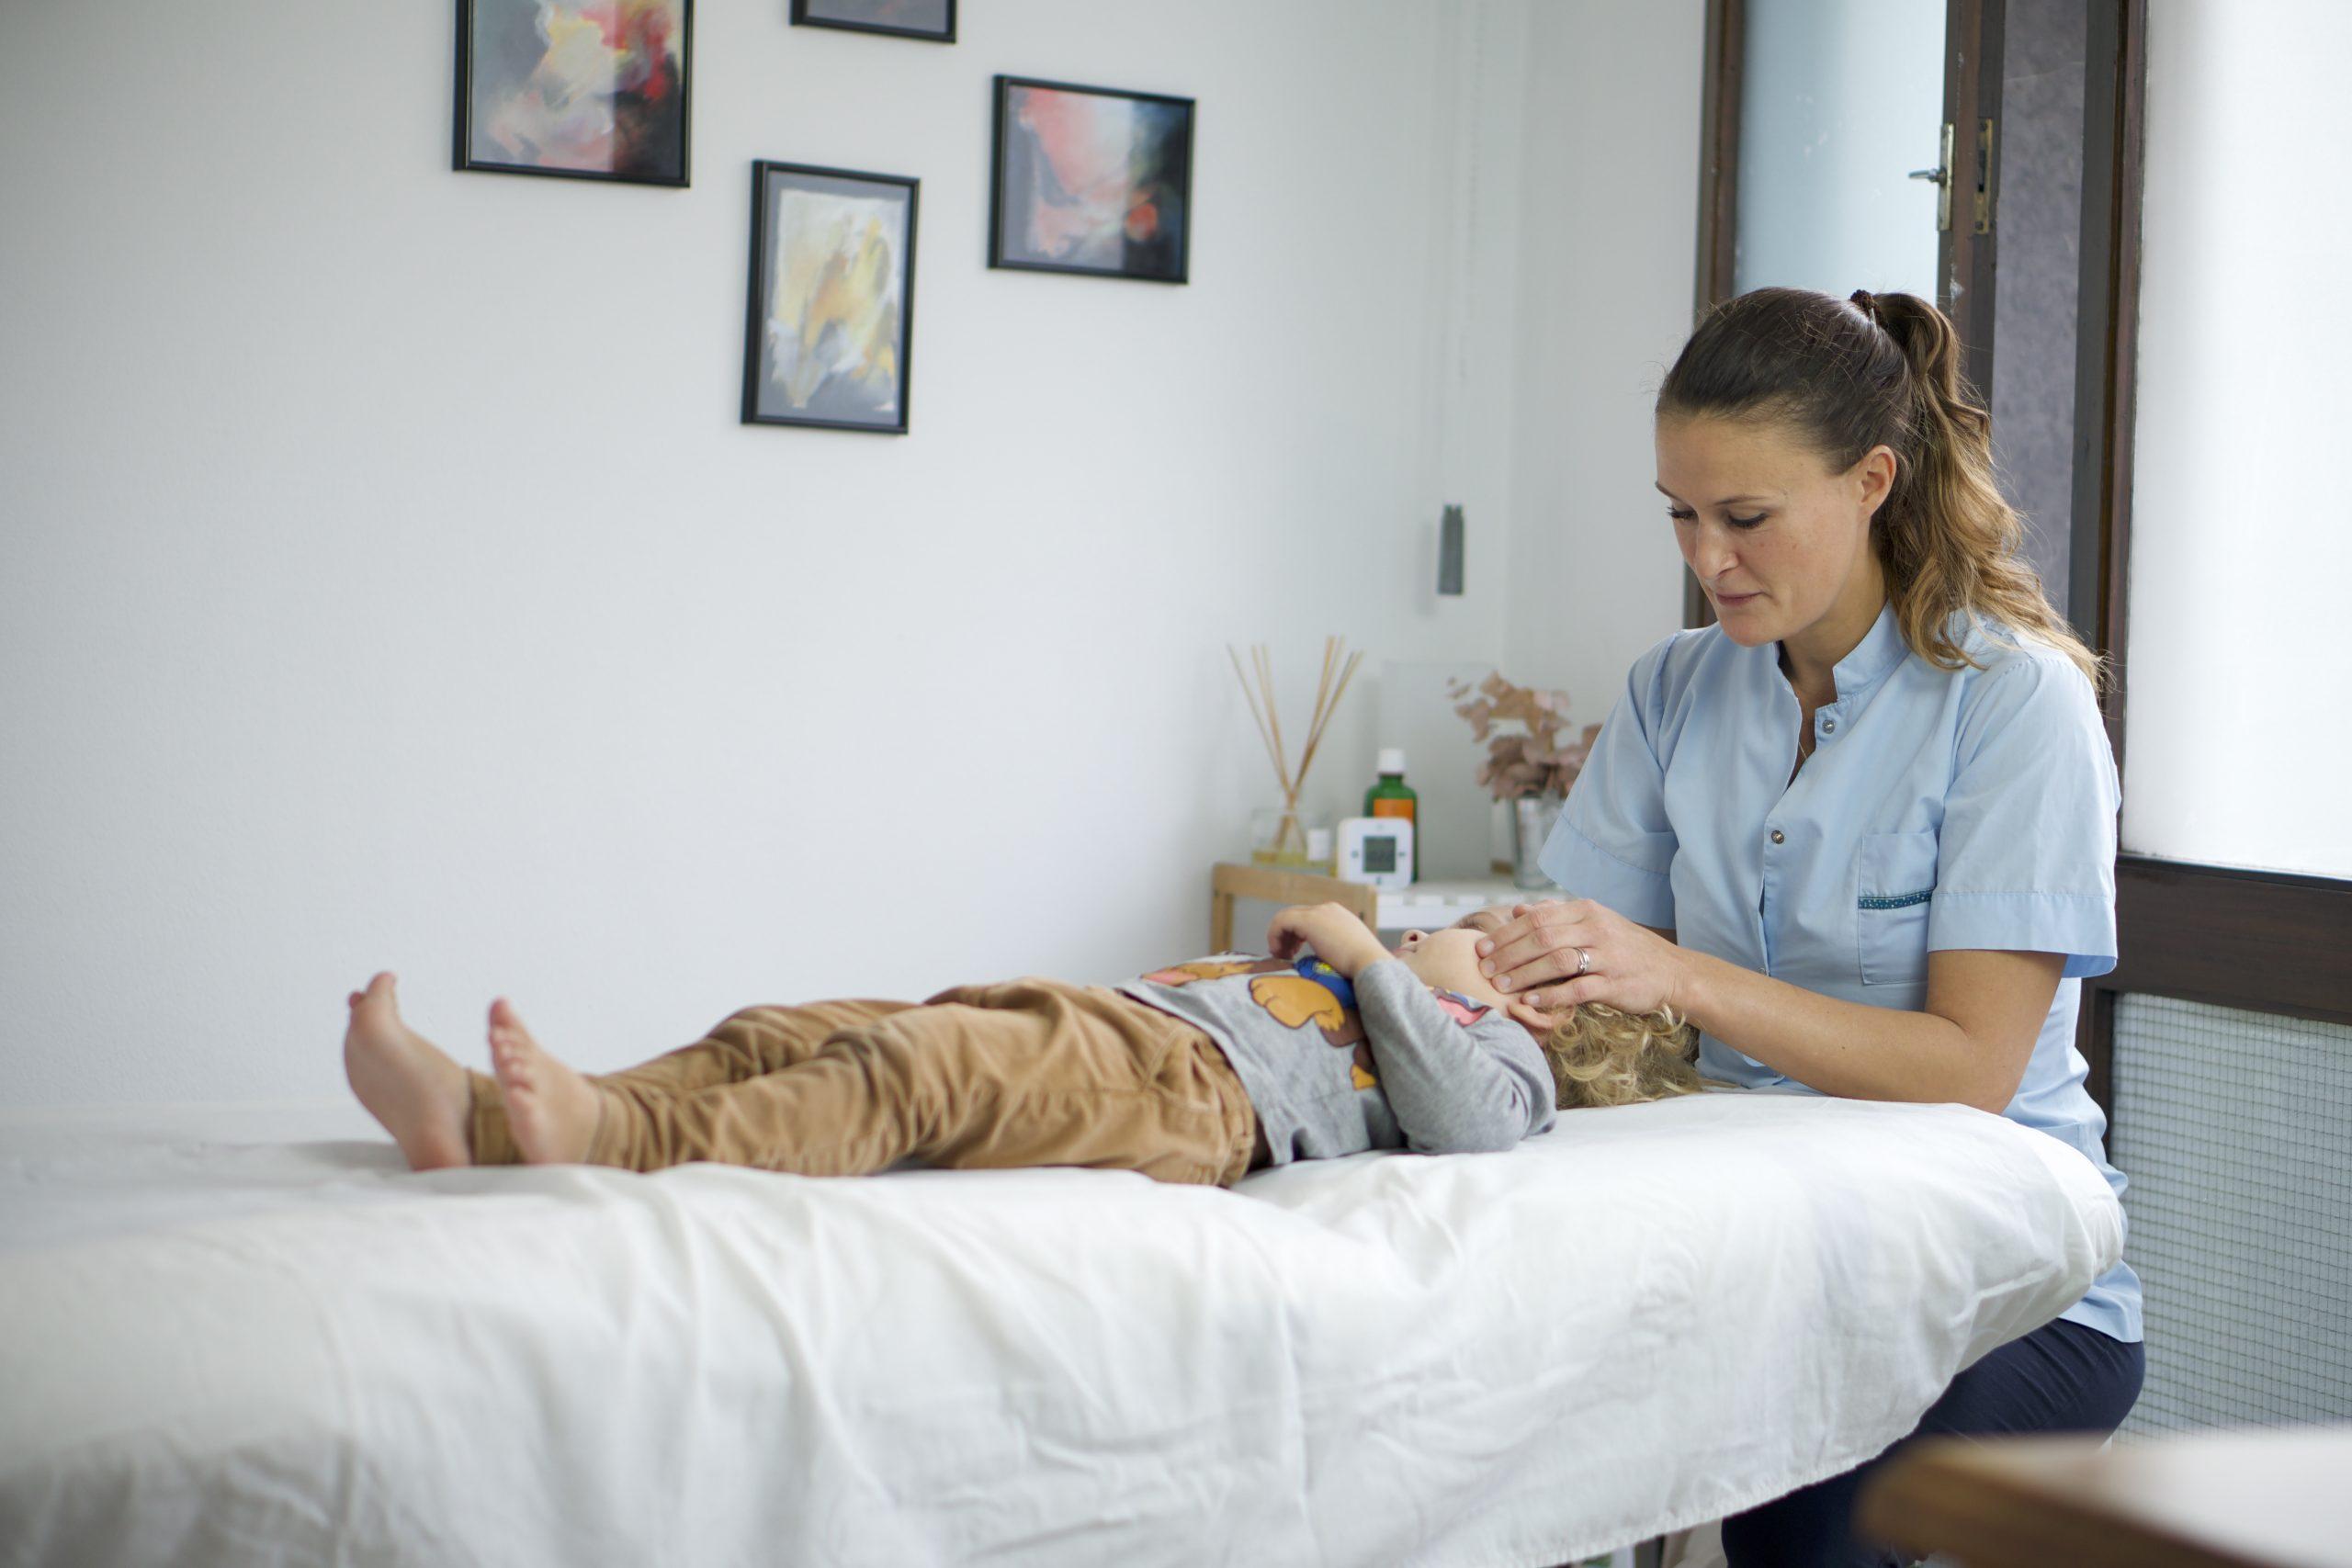 enfant ostéopathie, child osteopathy, niño osteopatía